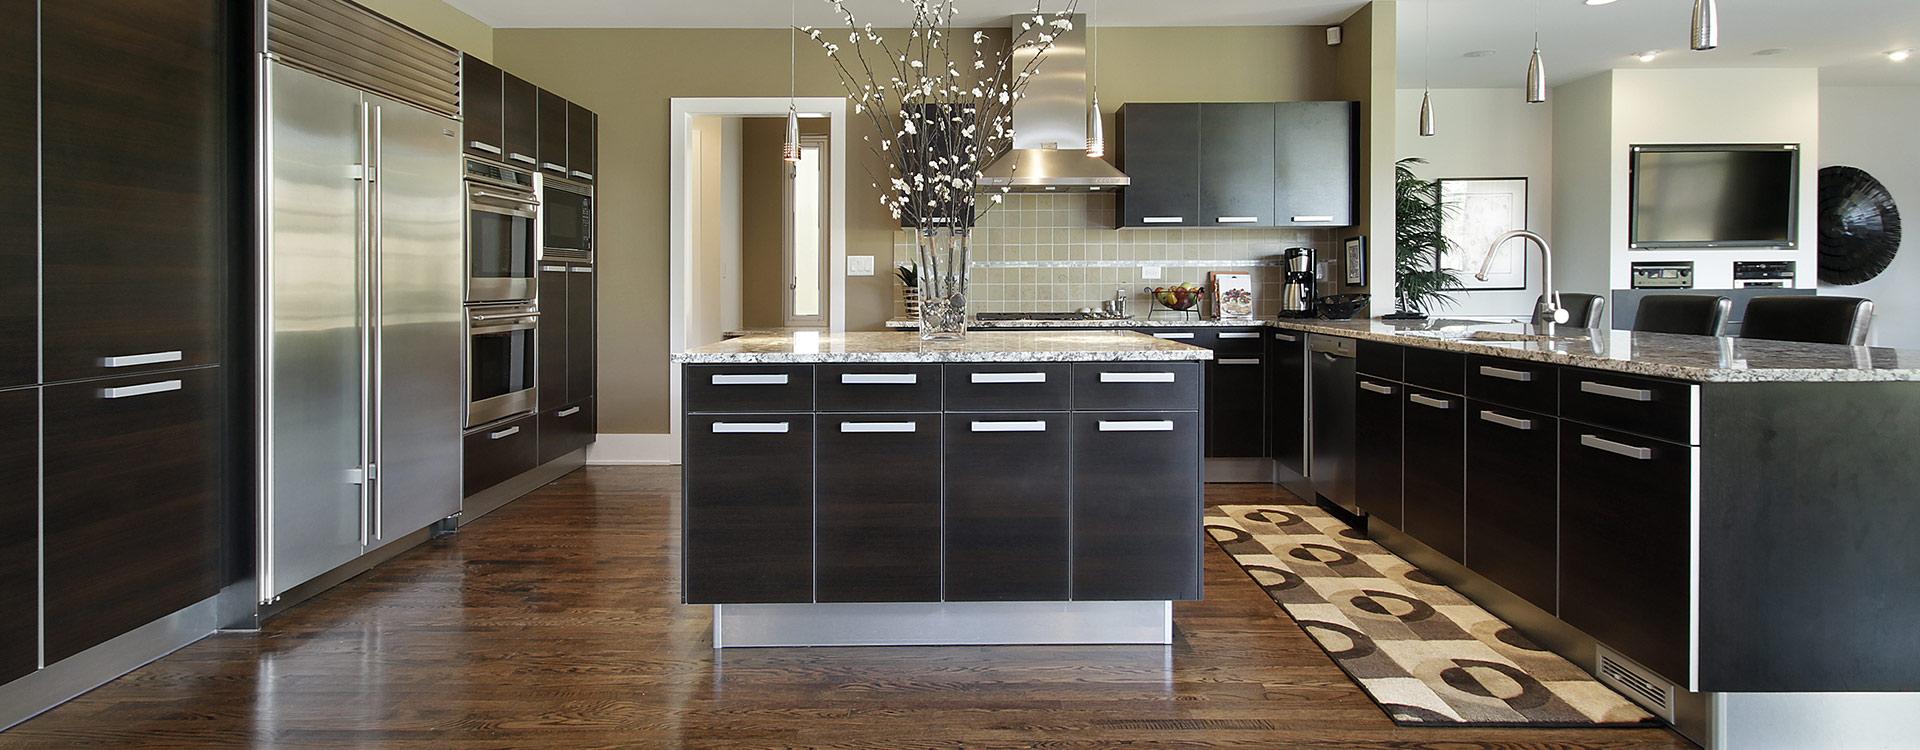 Custom Cabinets In Phoenix Cabinet Maker Cabinet Design